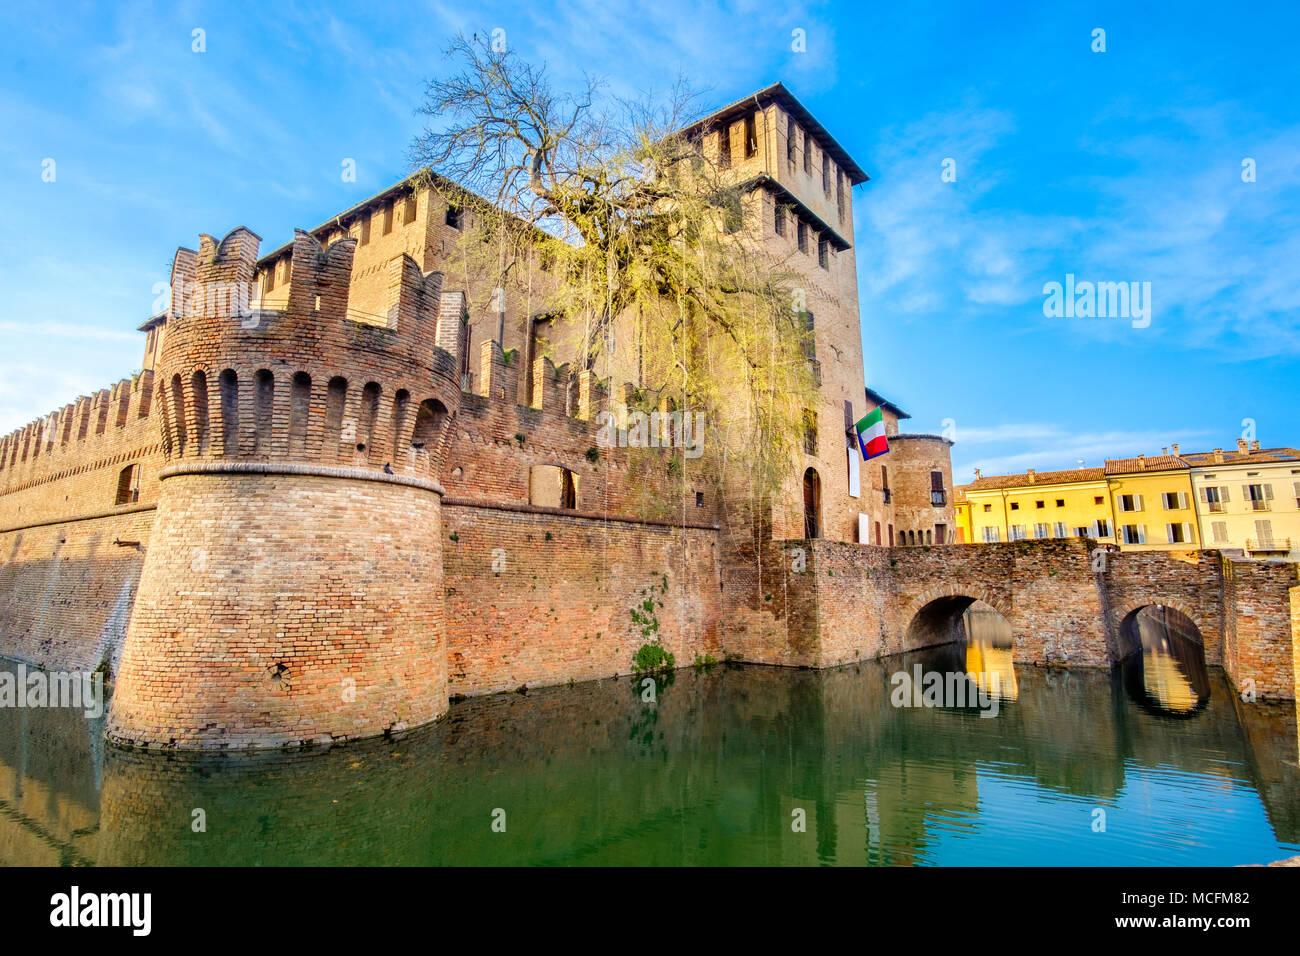 italian castles - Fontanellato - Parma - Emilia Romagna - Italy - Stock Image